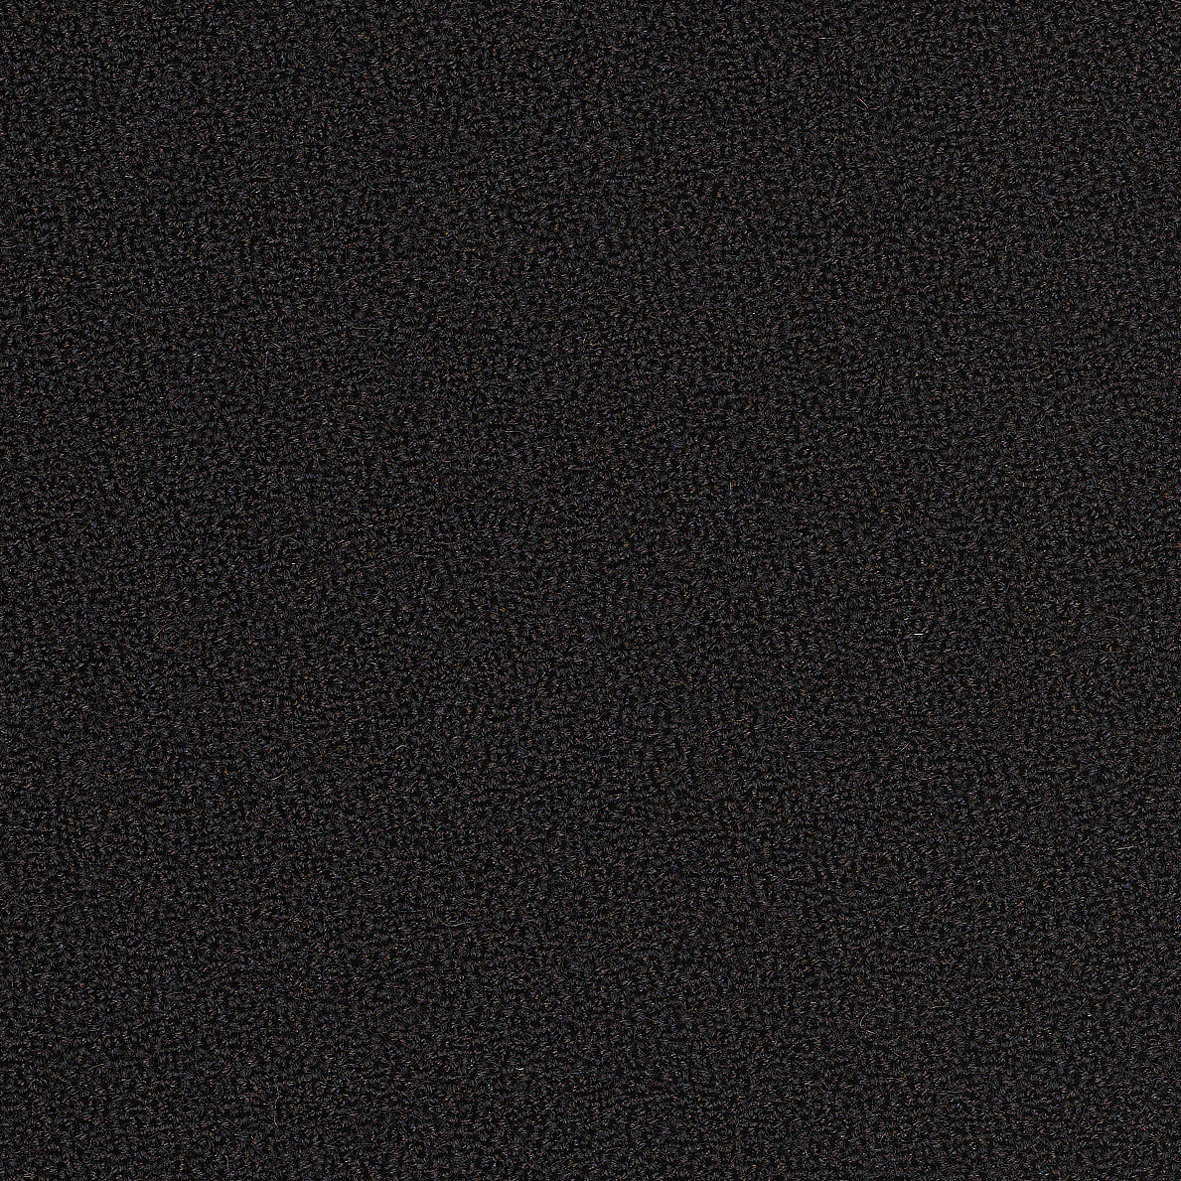 Softline bordskærmvæg sort B1600xH450 mm